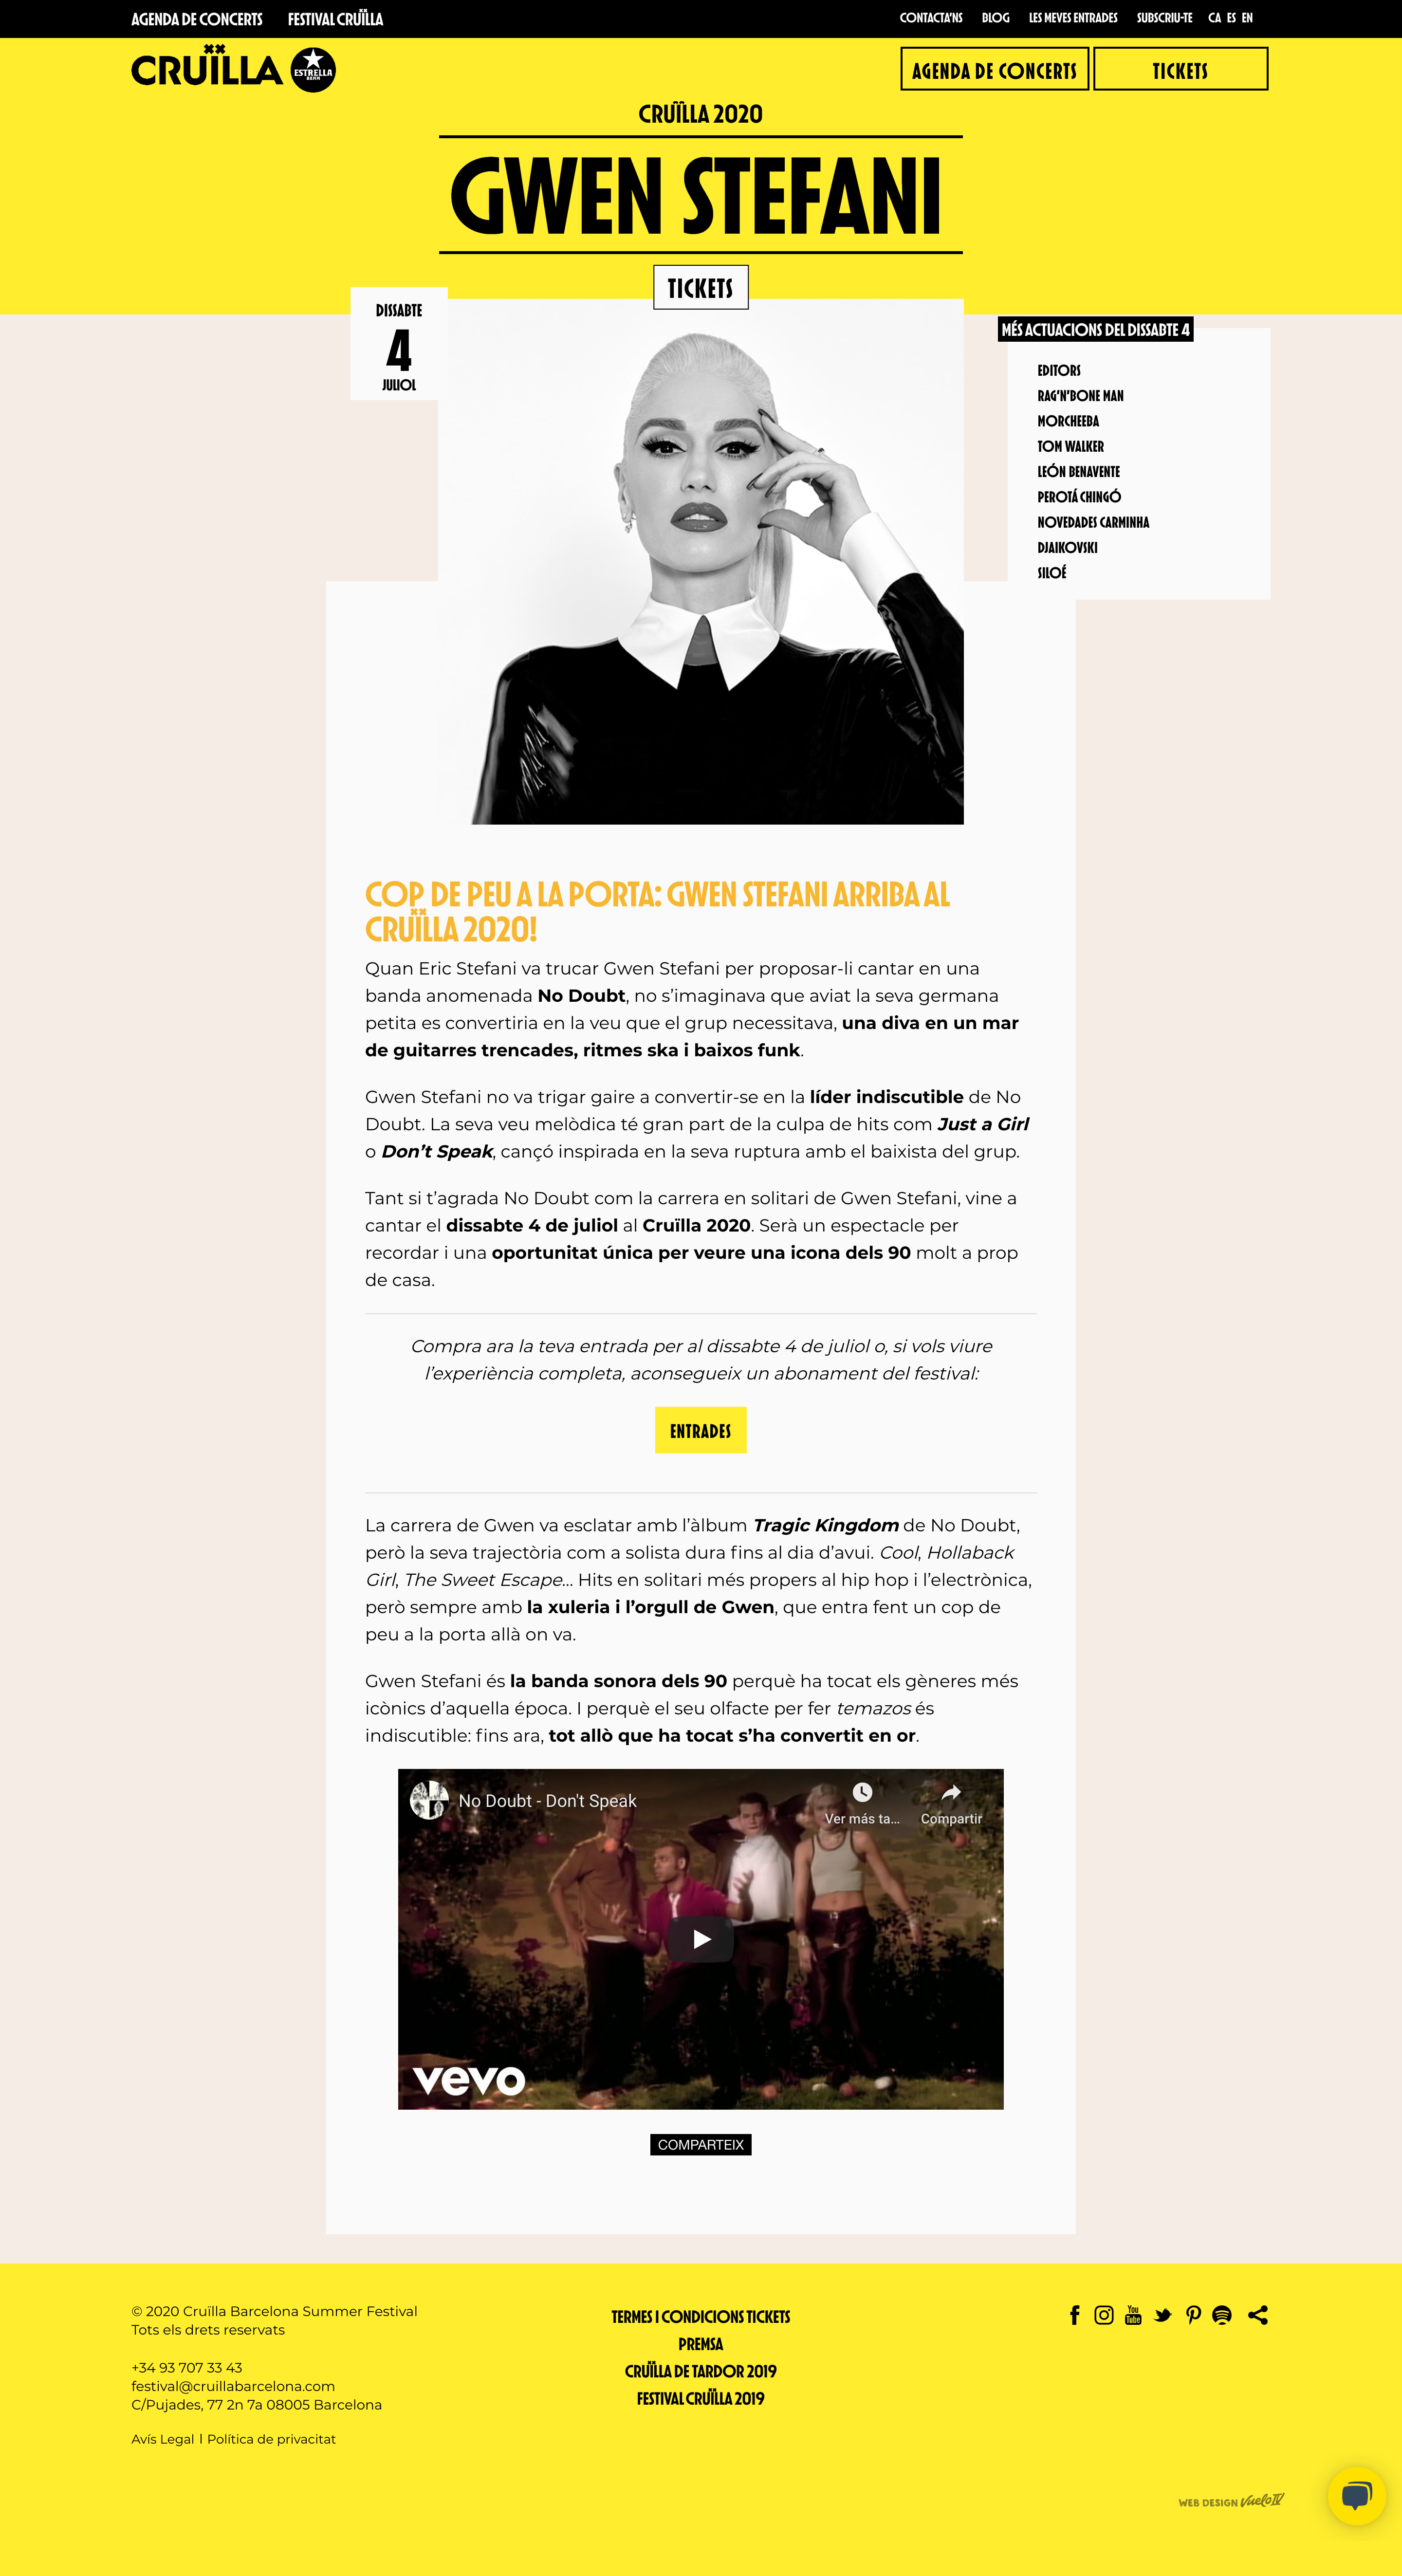 Cruilla barcelona summer festival website